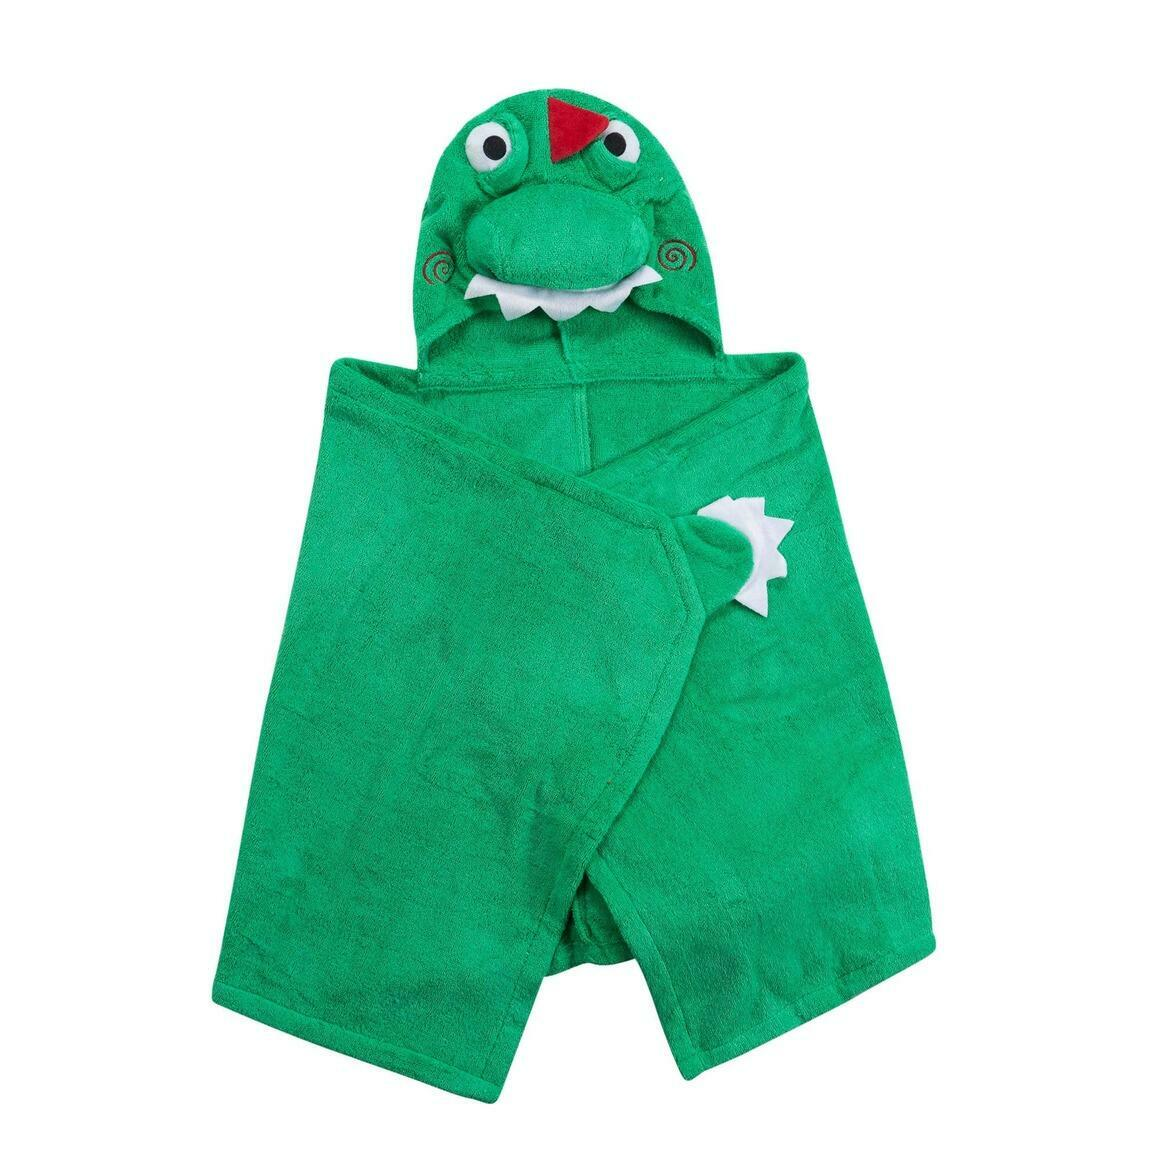 Devin the Dinosaur Toddler Towel | Trada Marketplace